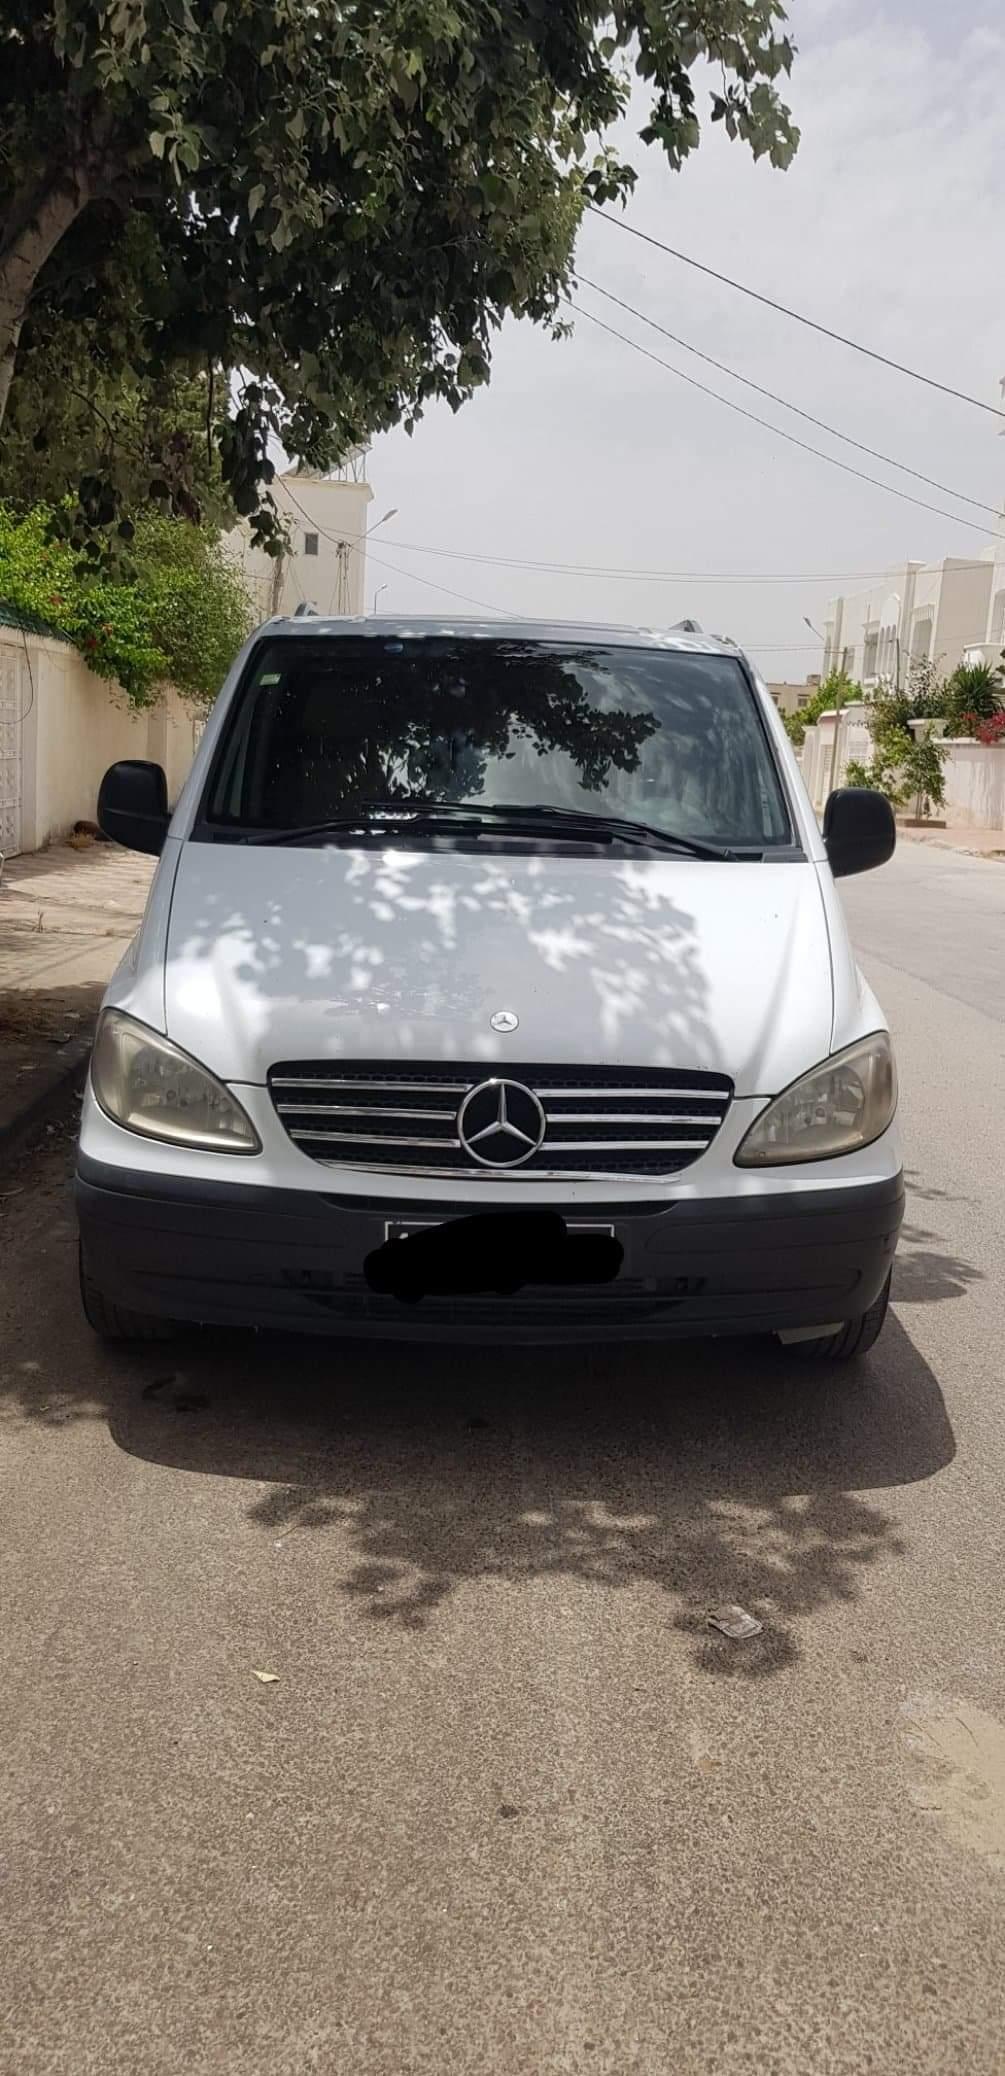 vente voiture occasion tunisie mercedes vito